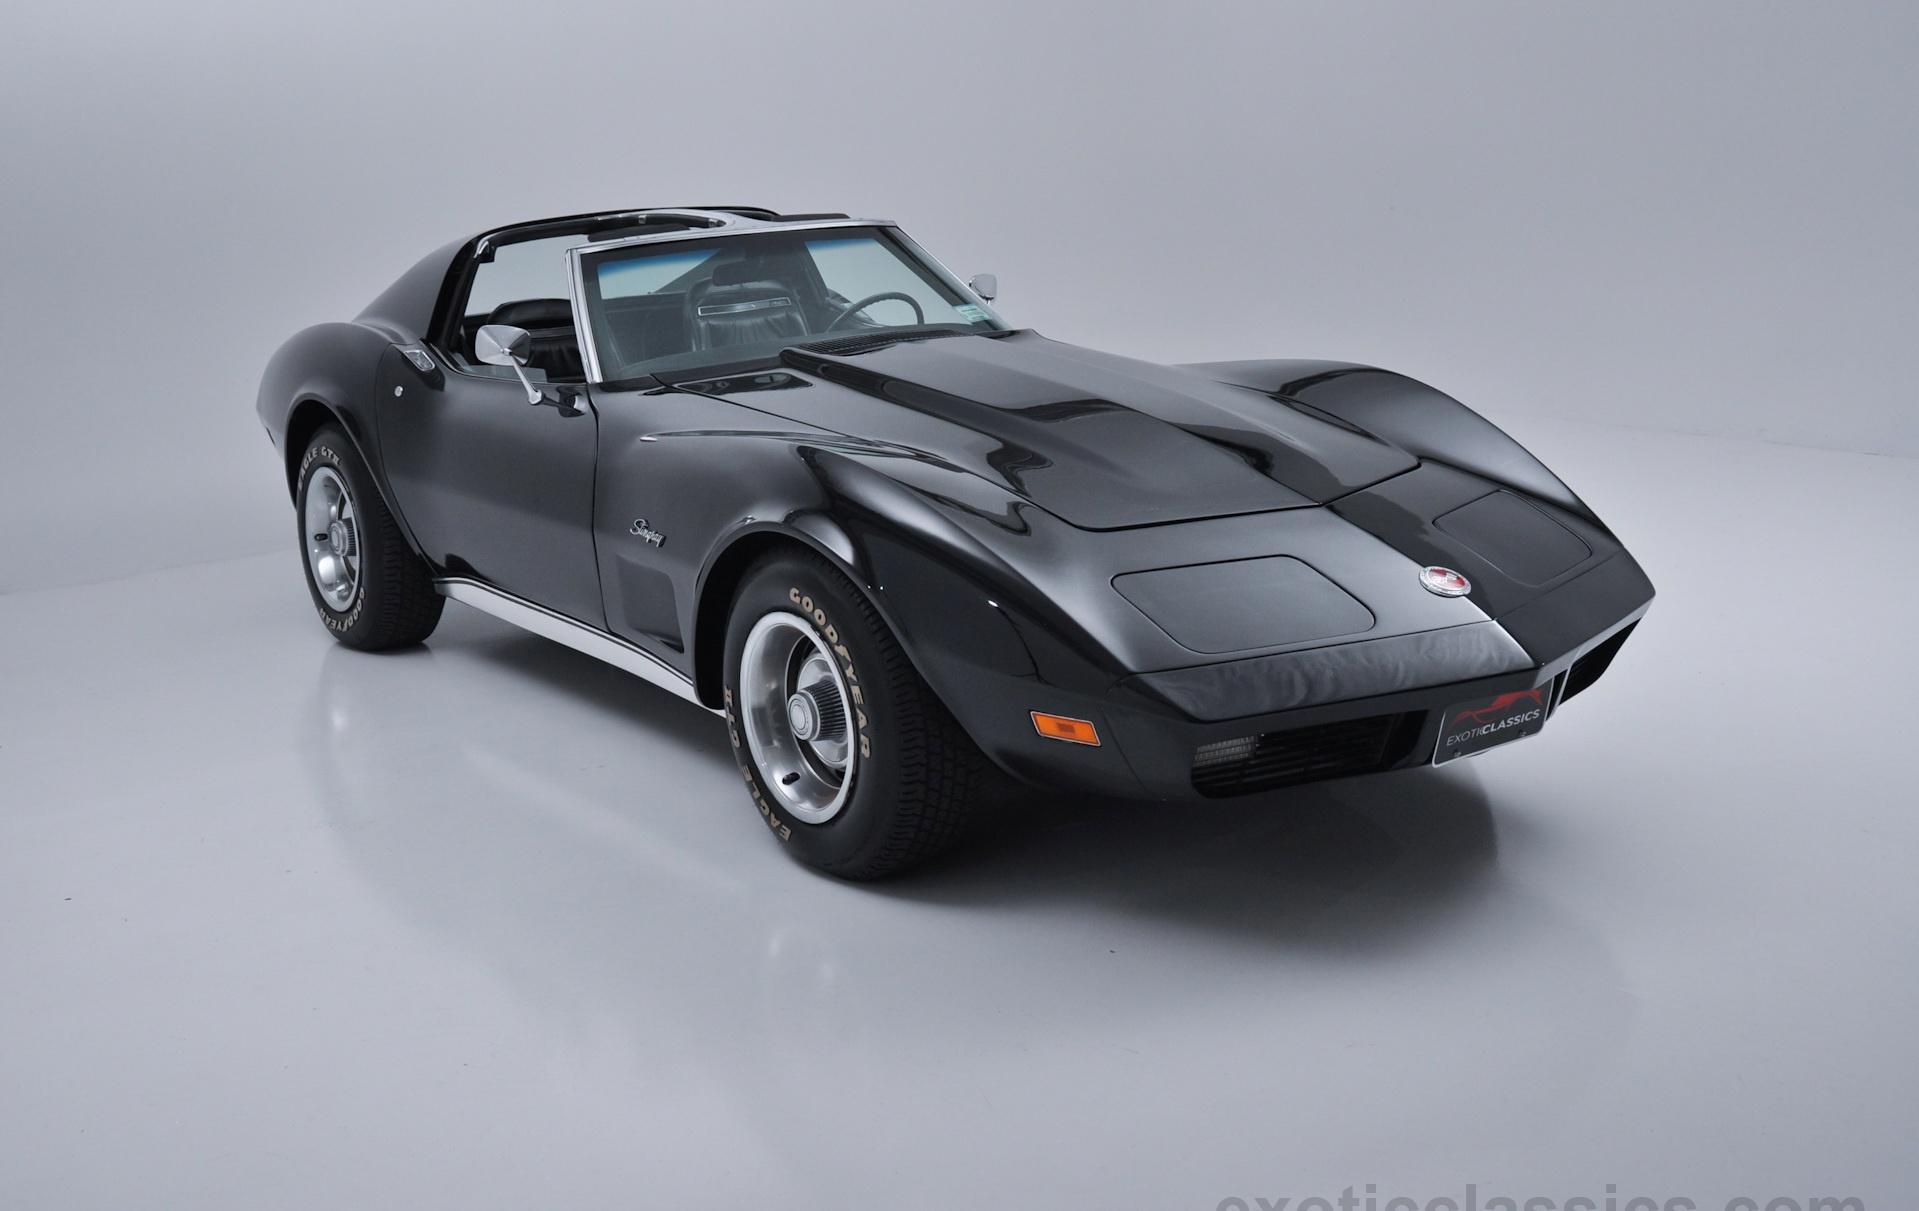 Ferrari Long Island >> 1974 Chevrolet Corvette Stingray - Champion Motors International l Luxury Classic Vehicle ...